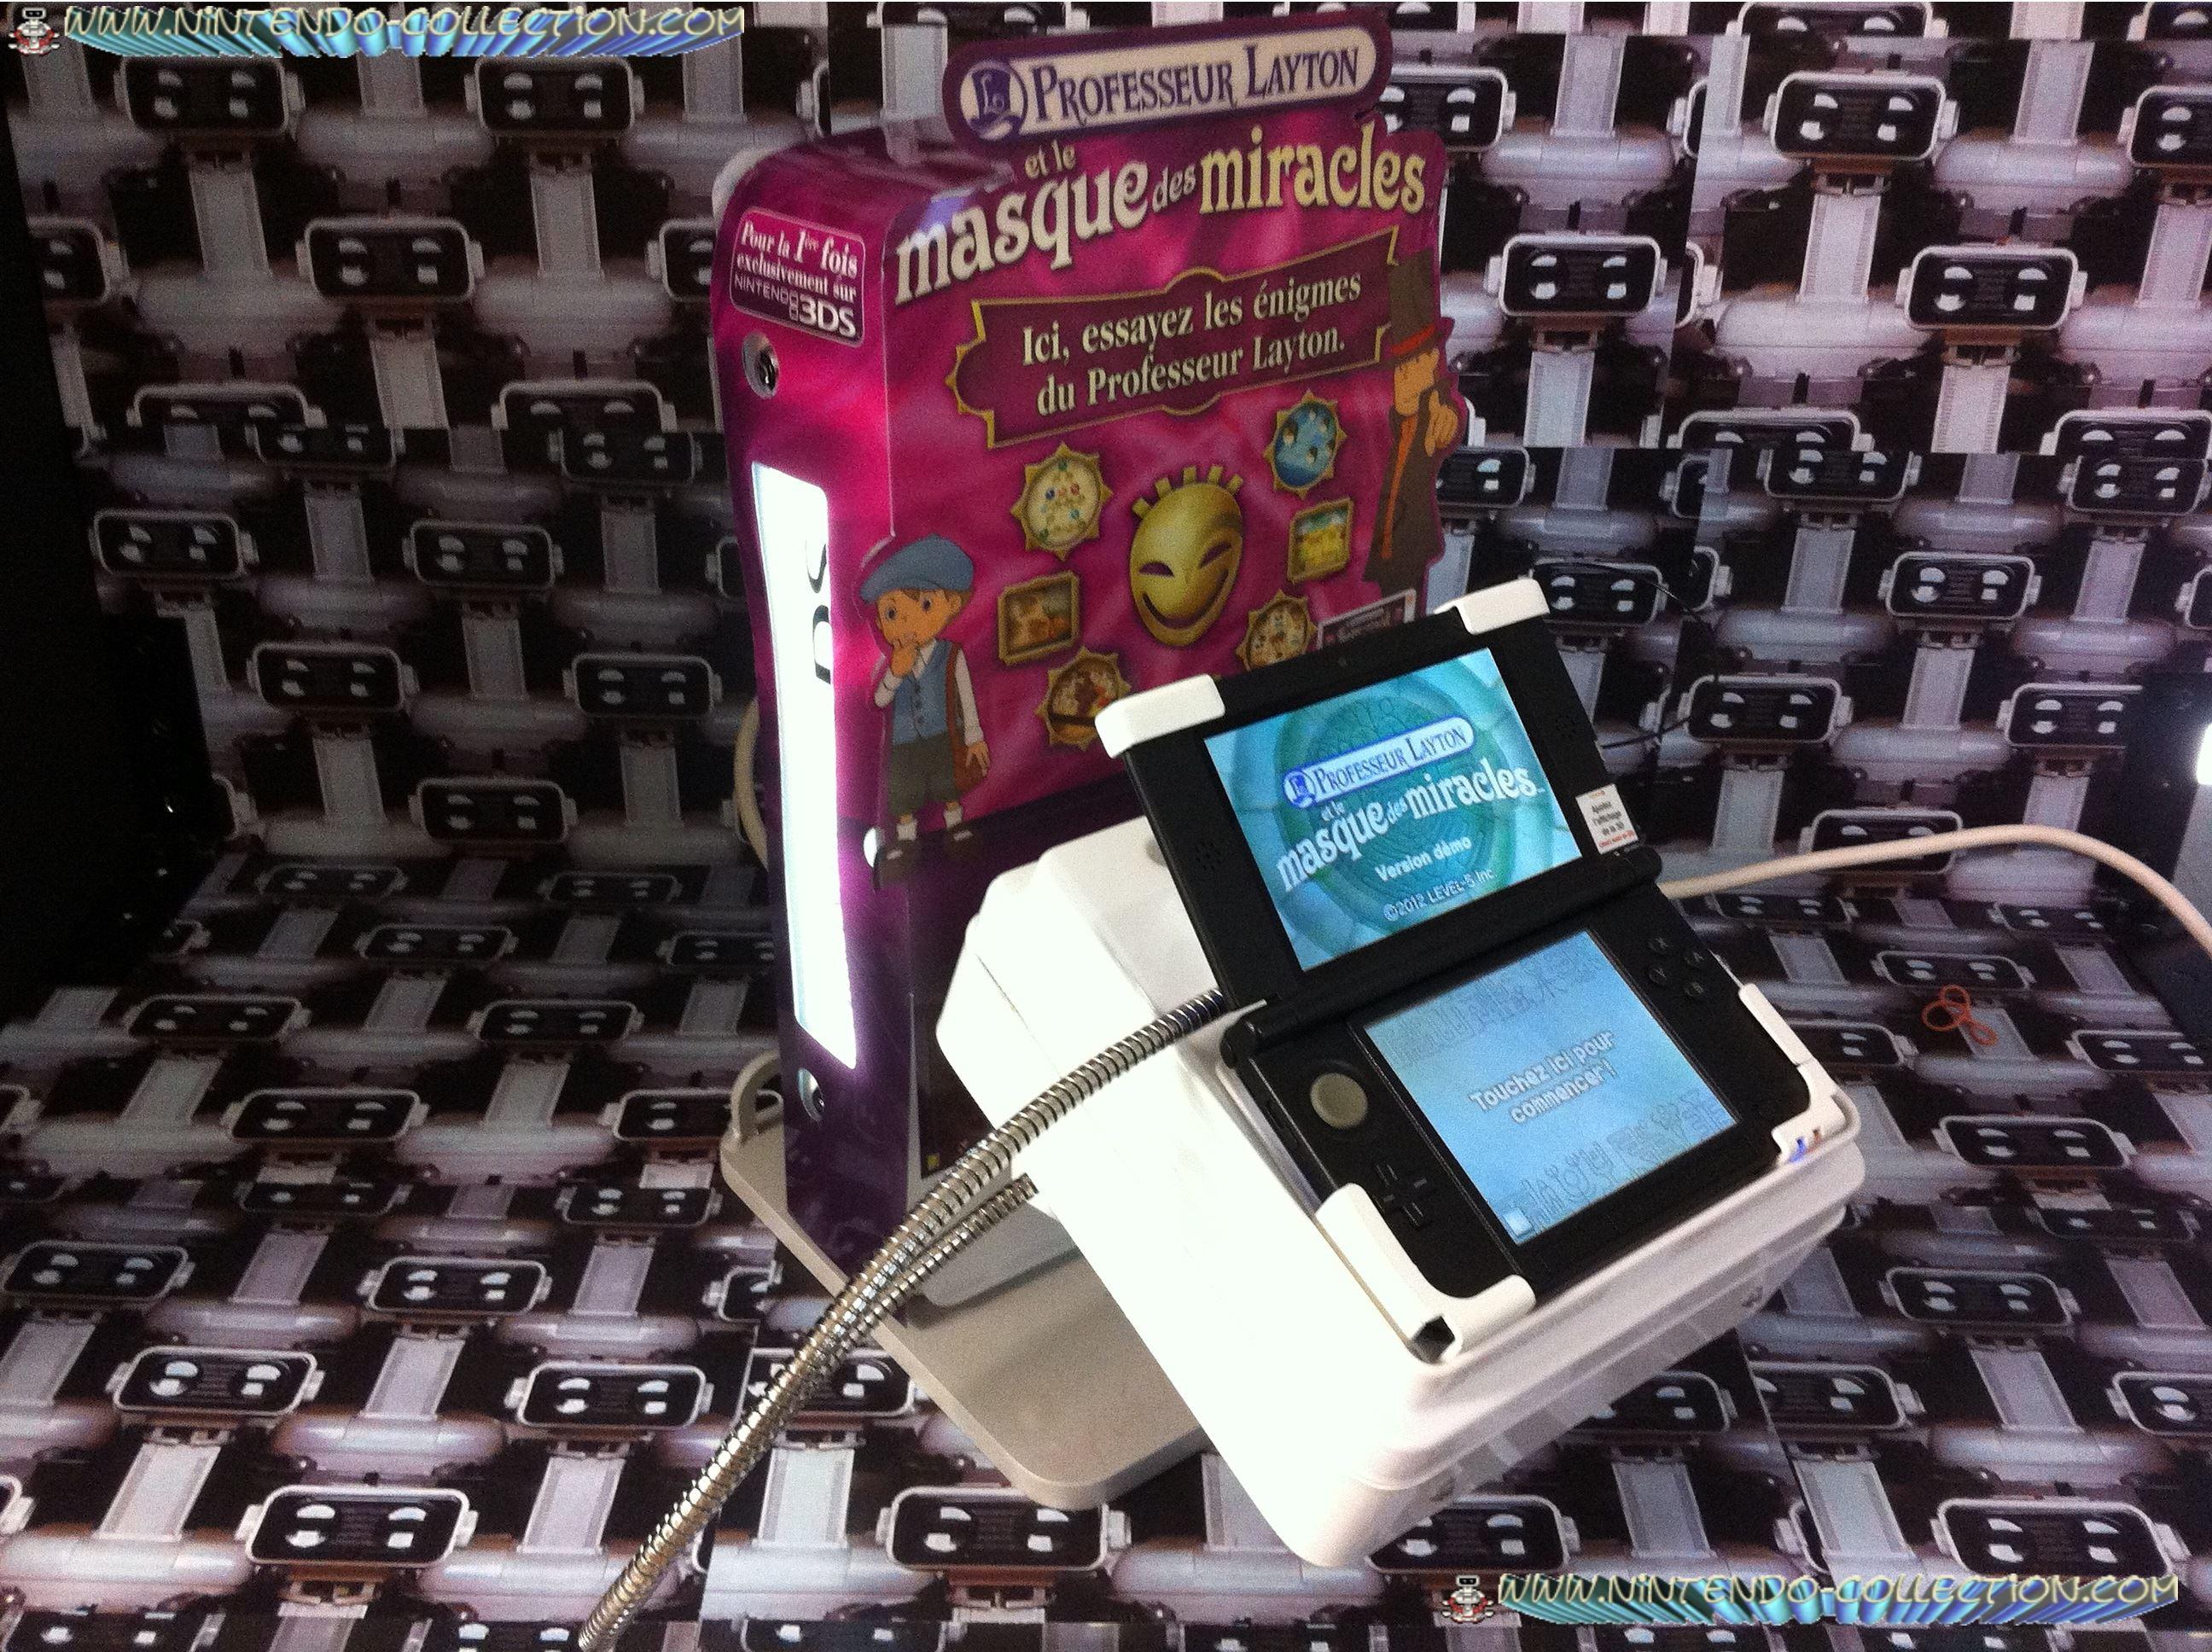 www.nintendo-collection.com - Borne Kiosk  Demo 3DS XL LL Comptoir Counter Display with Layton Skin